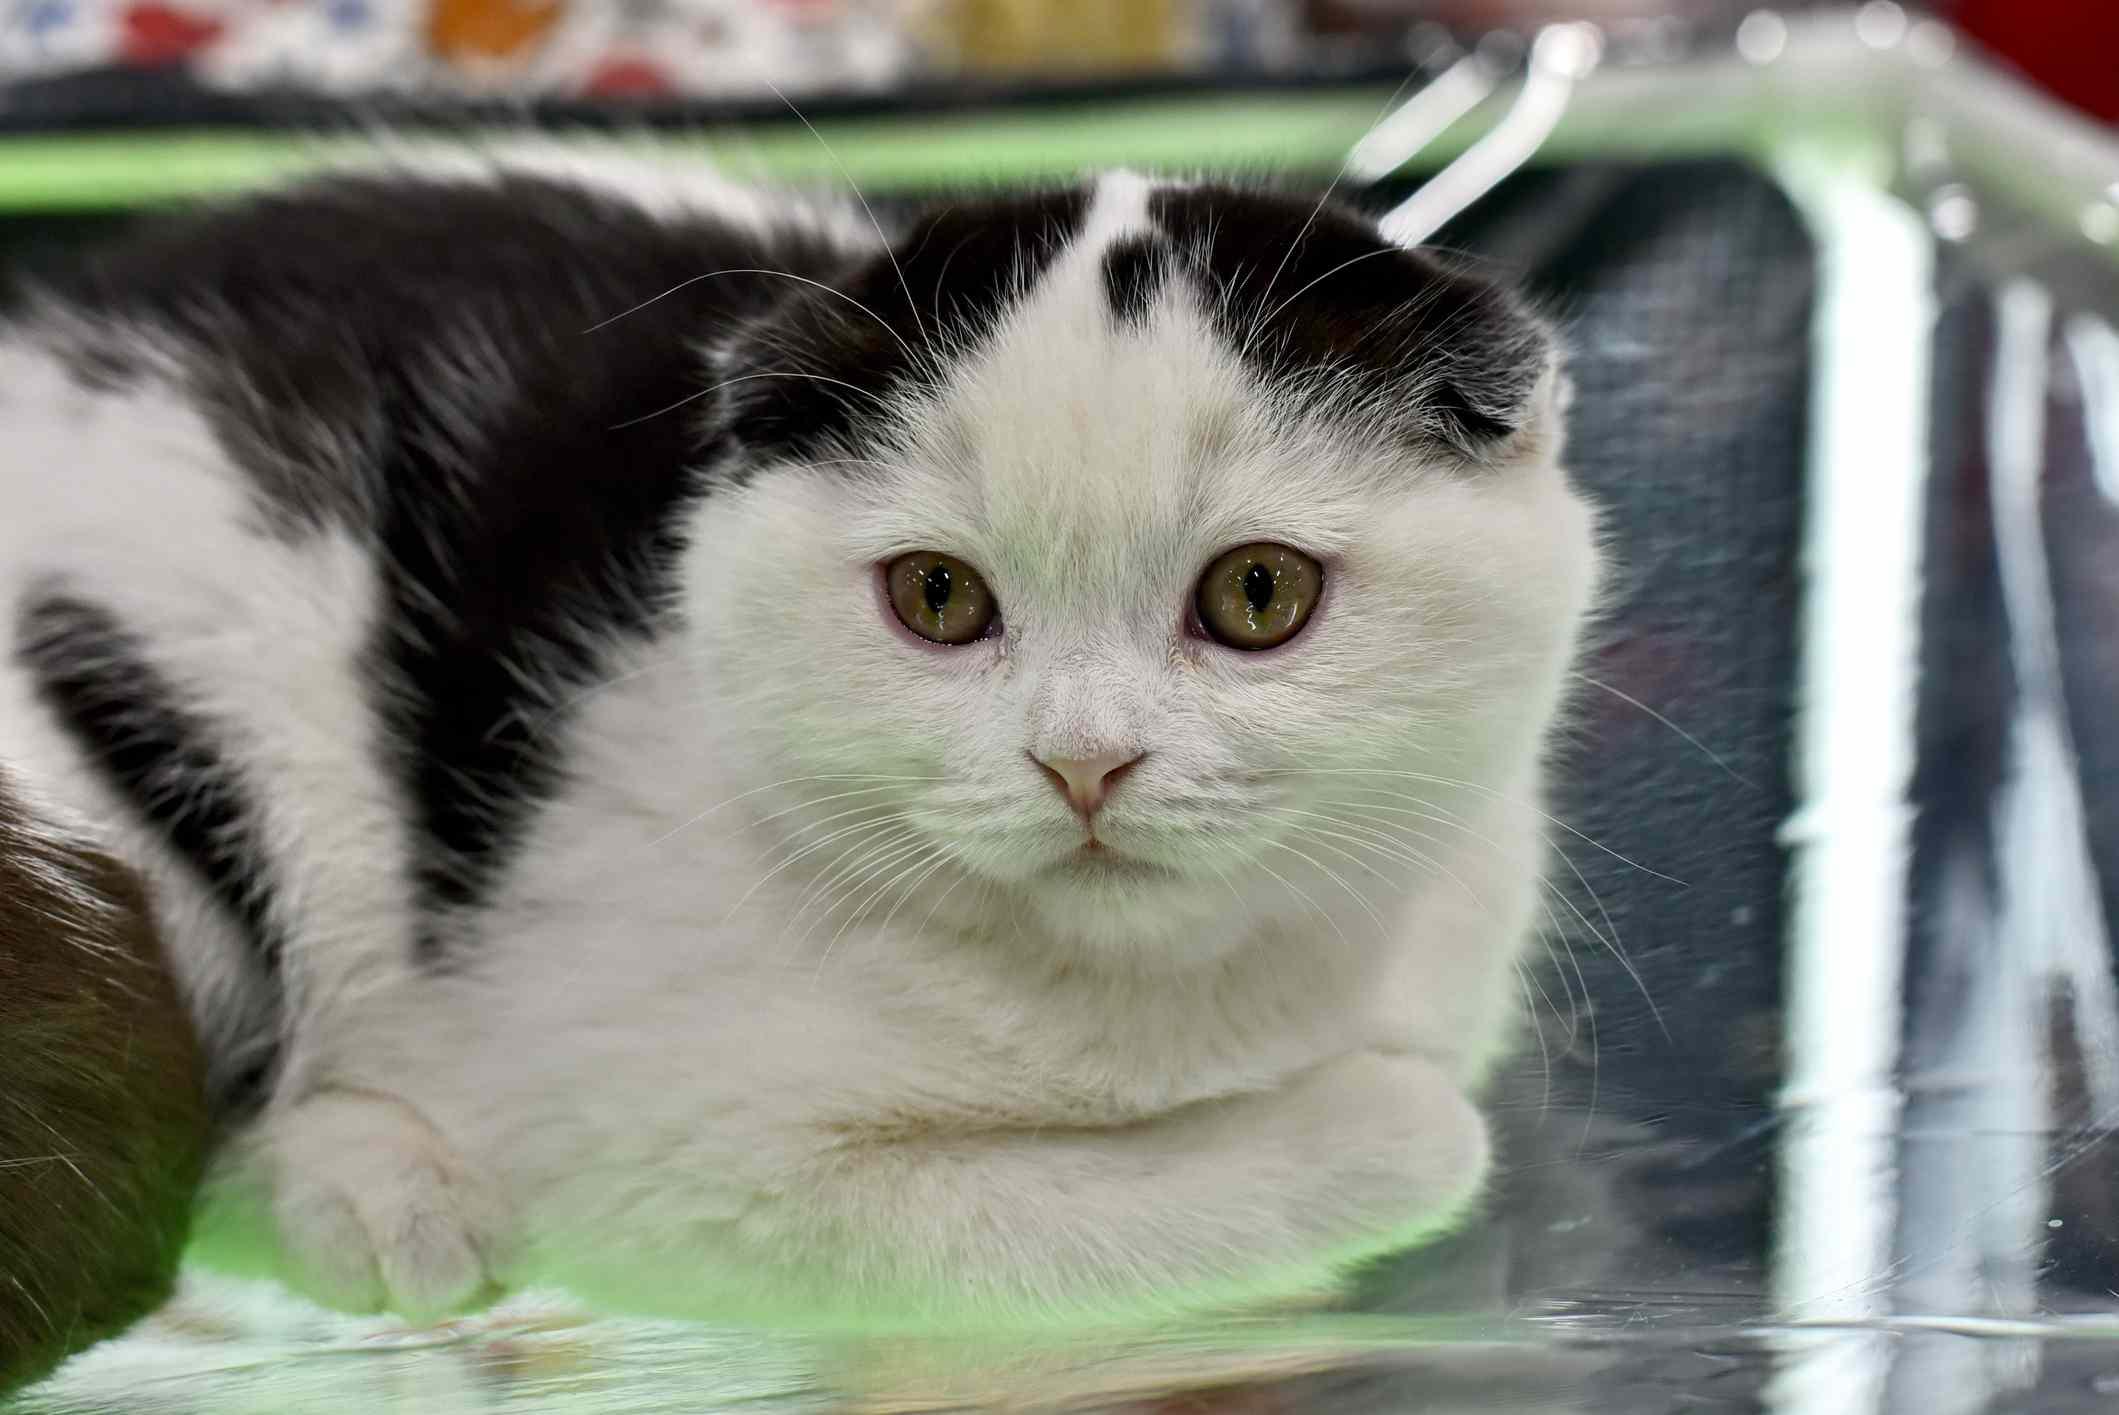 Black and white Scottish Fold cat lying down